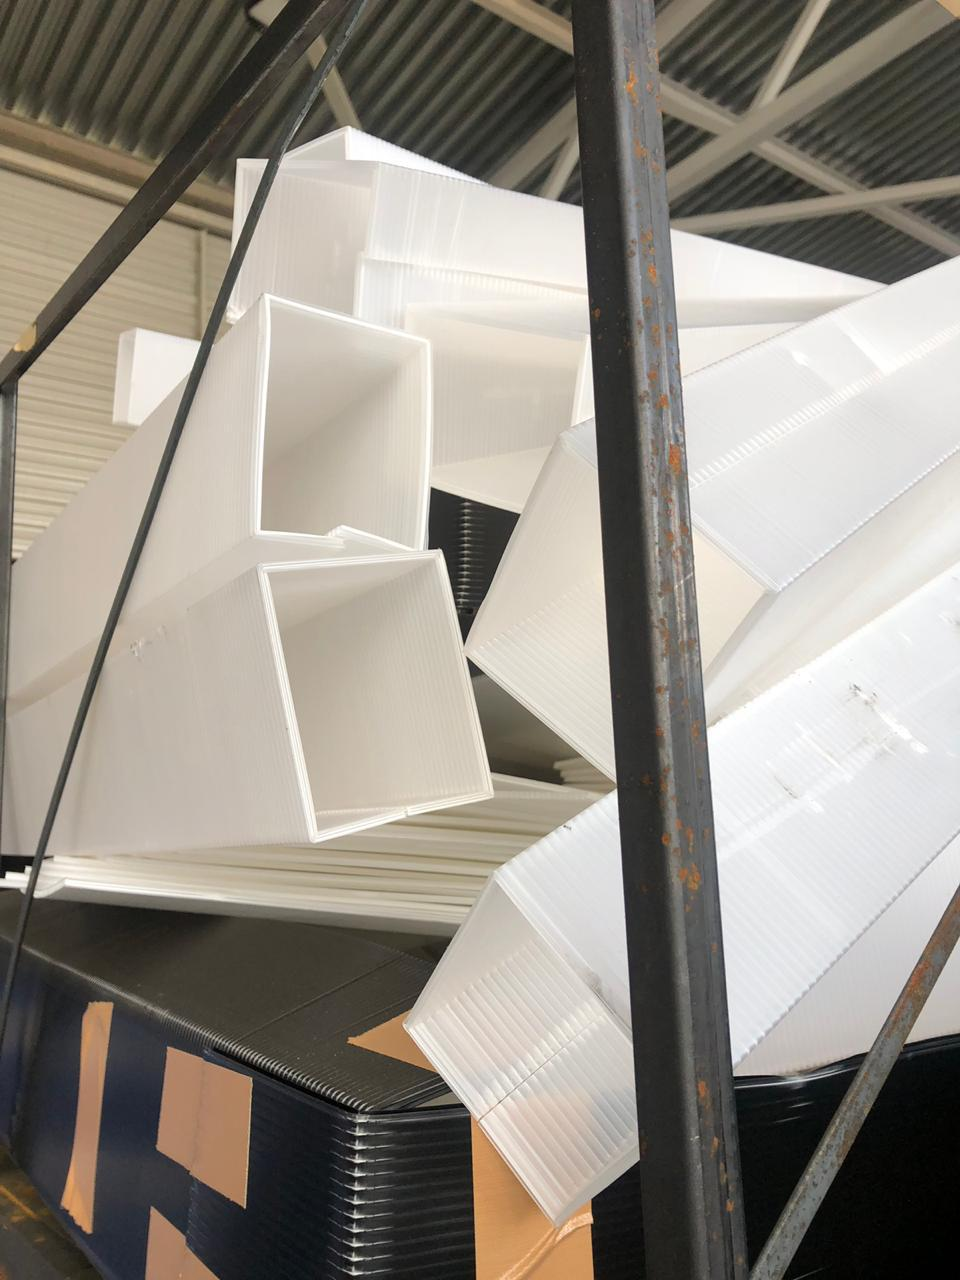 Porous PP cushioning sheets waste